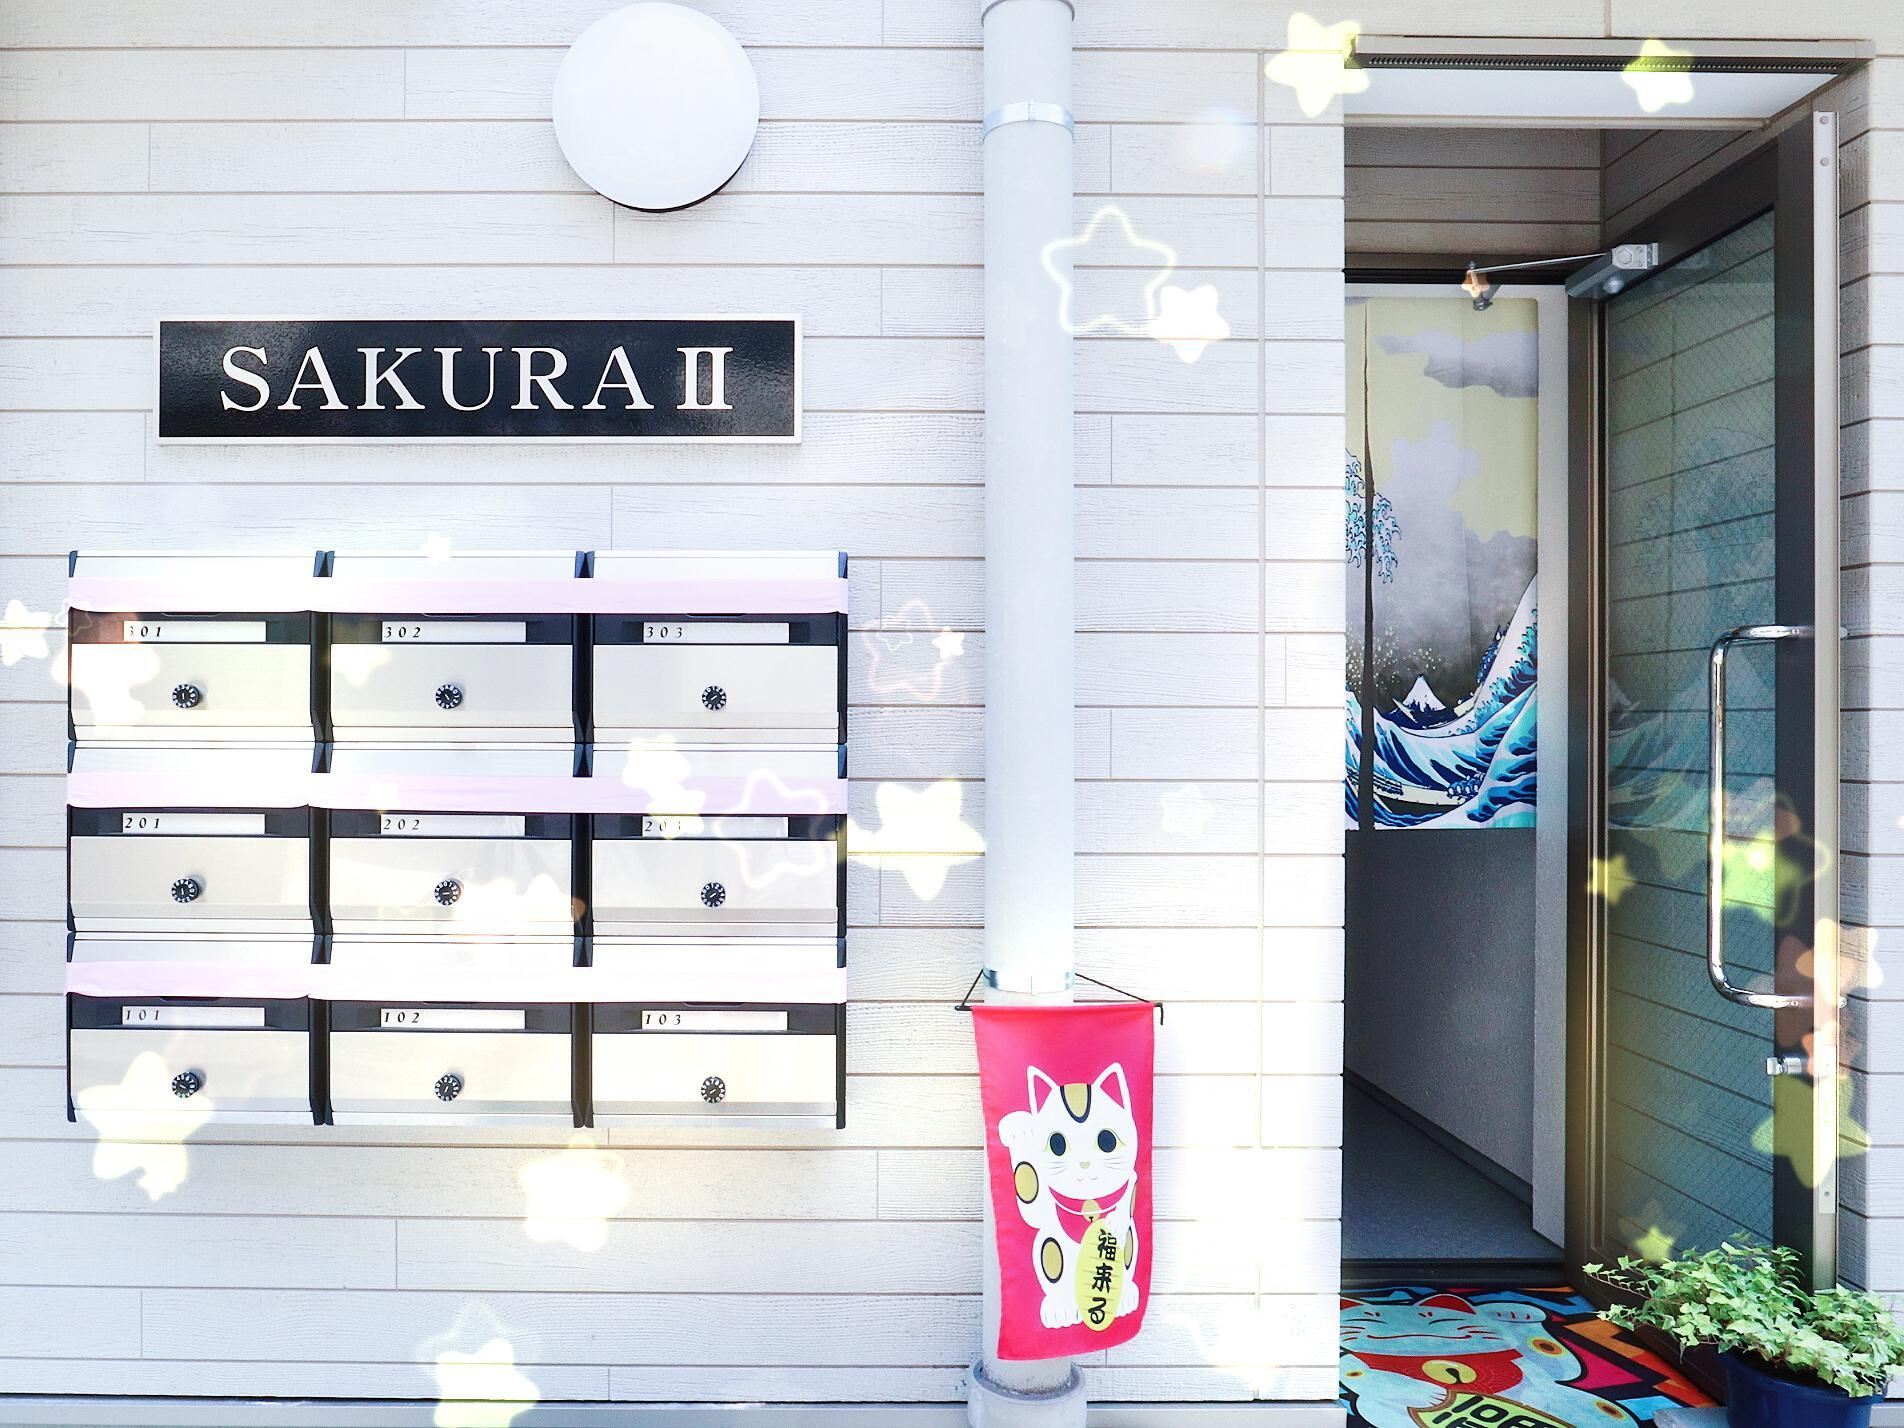 Sakura Asakusa Private Apartment, Sumida